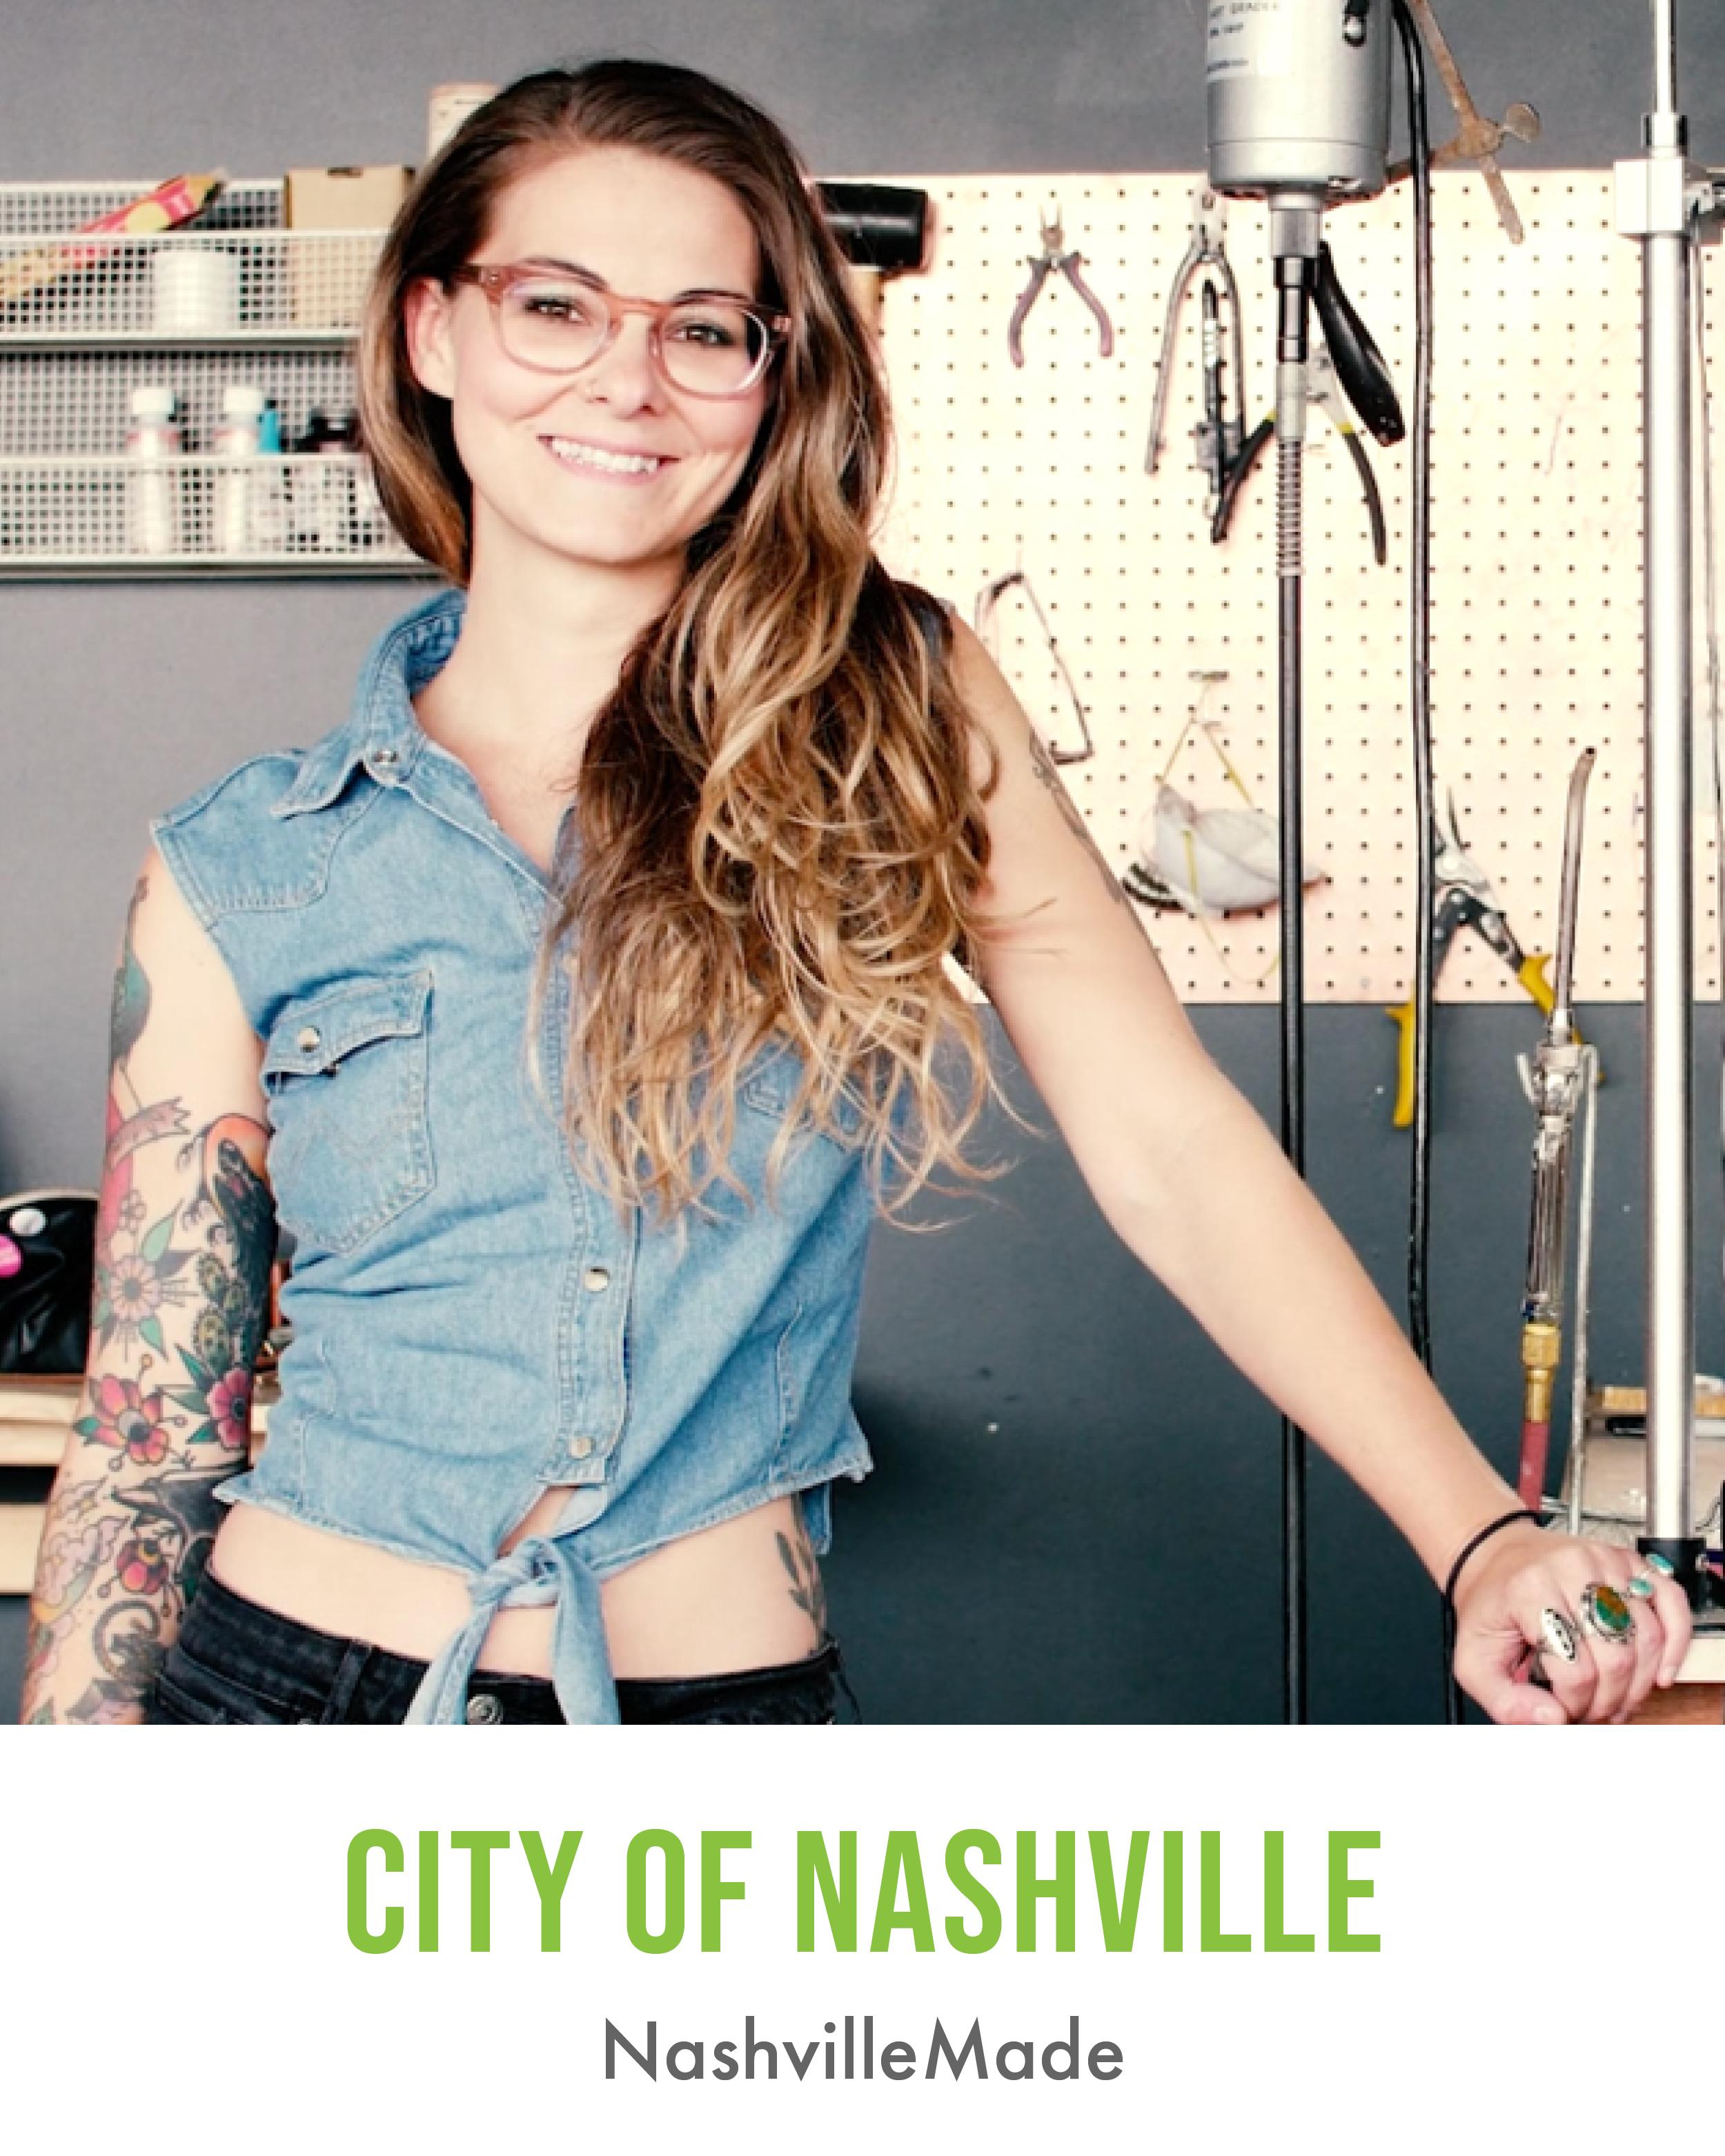 City of Nashville NashvilleMade